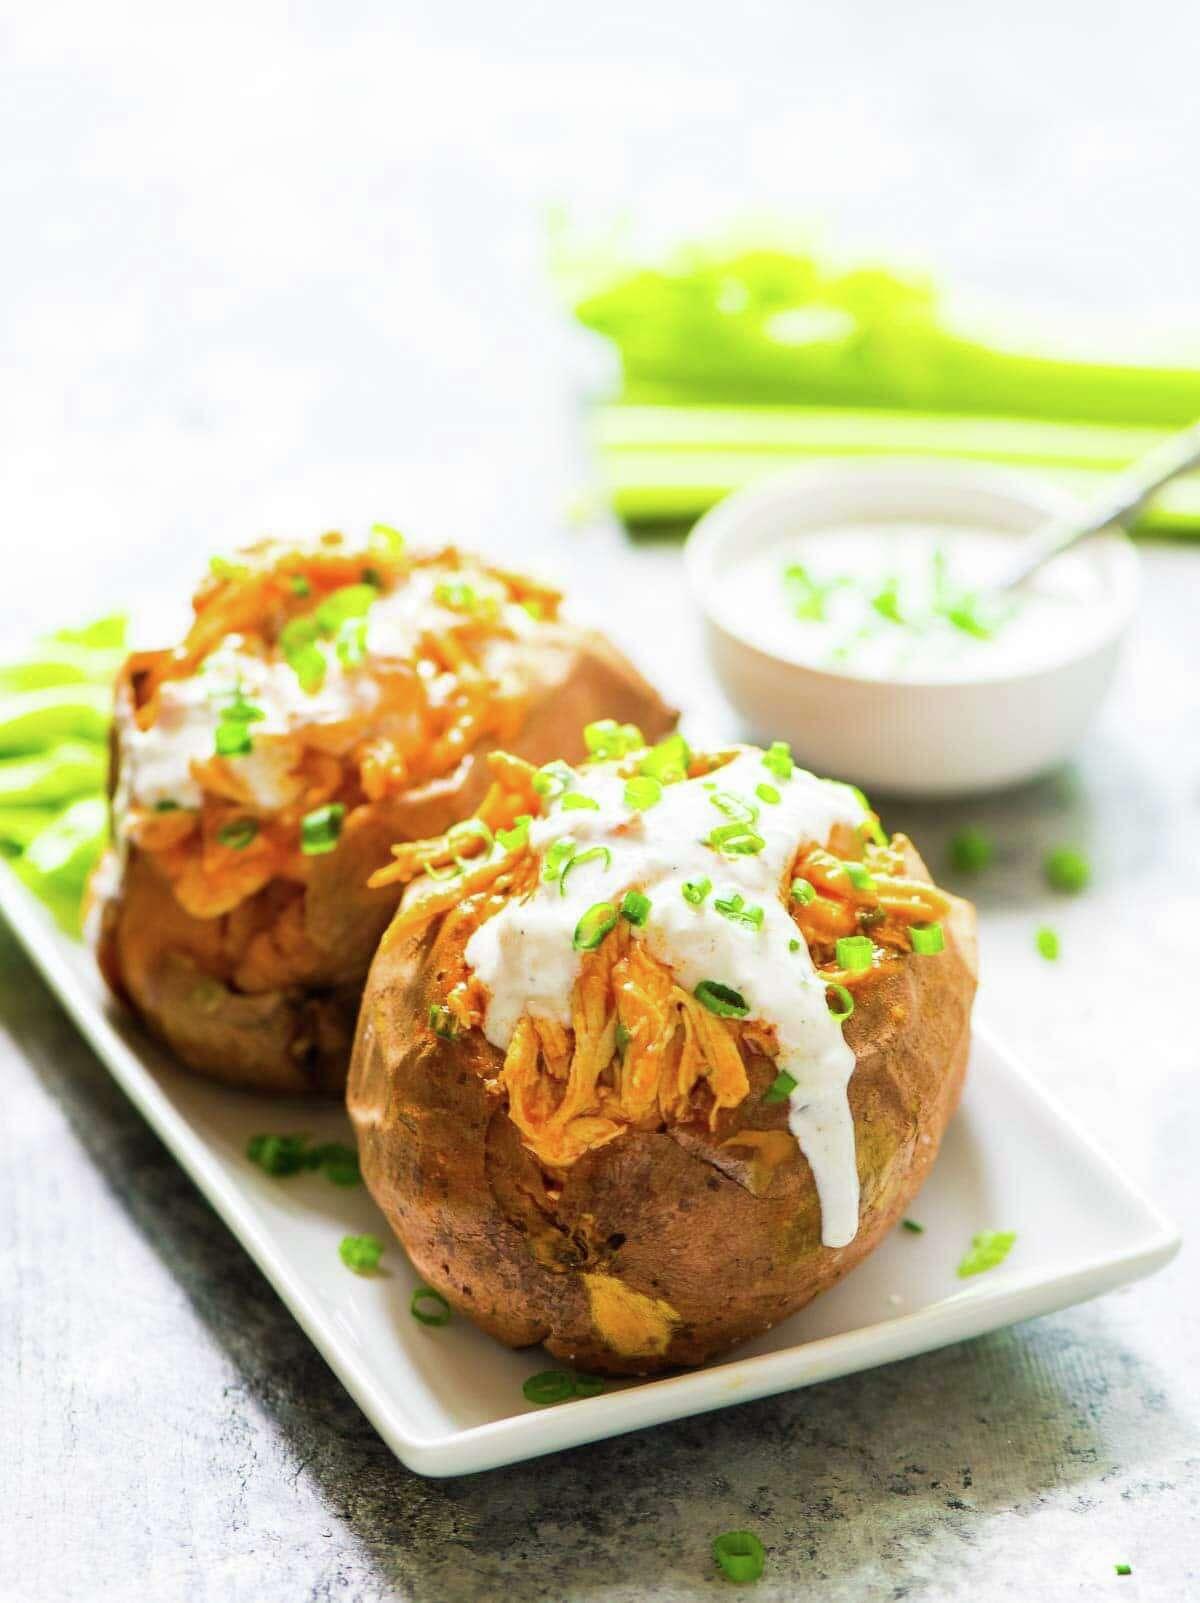 Buffalo Chicken Sweet Potatoes, by Erin Clarke, author of